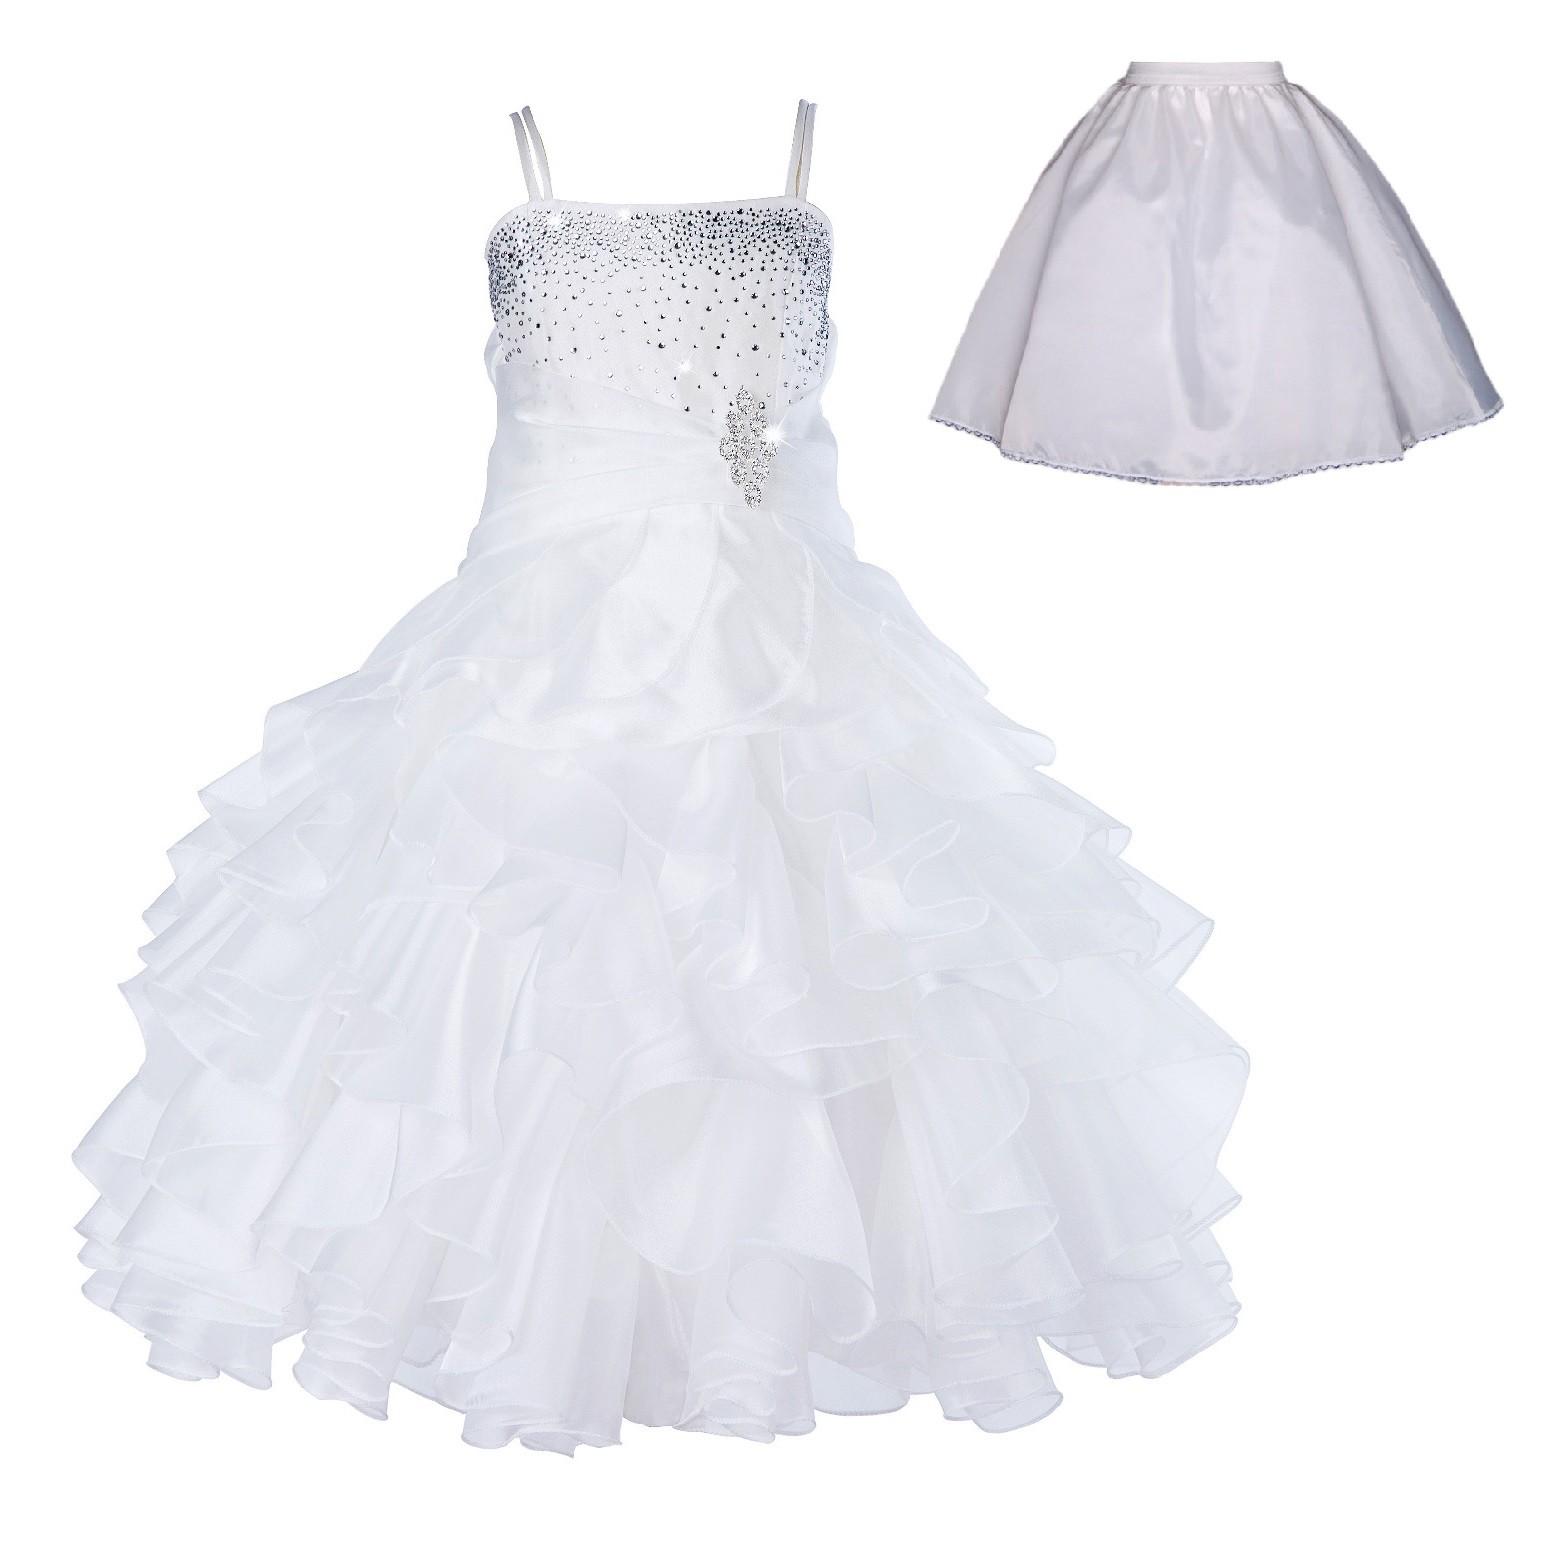 Ivory Rhinestone Organza Layers Flower Girl Dress Elegant Stunning 164S